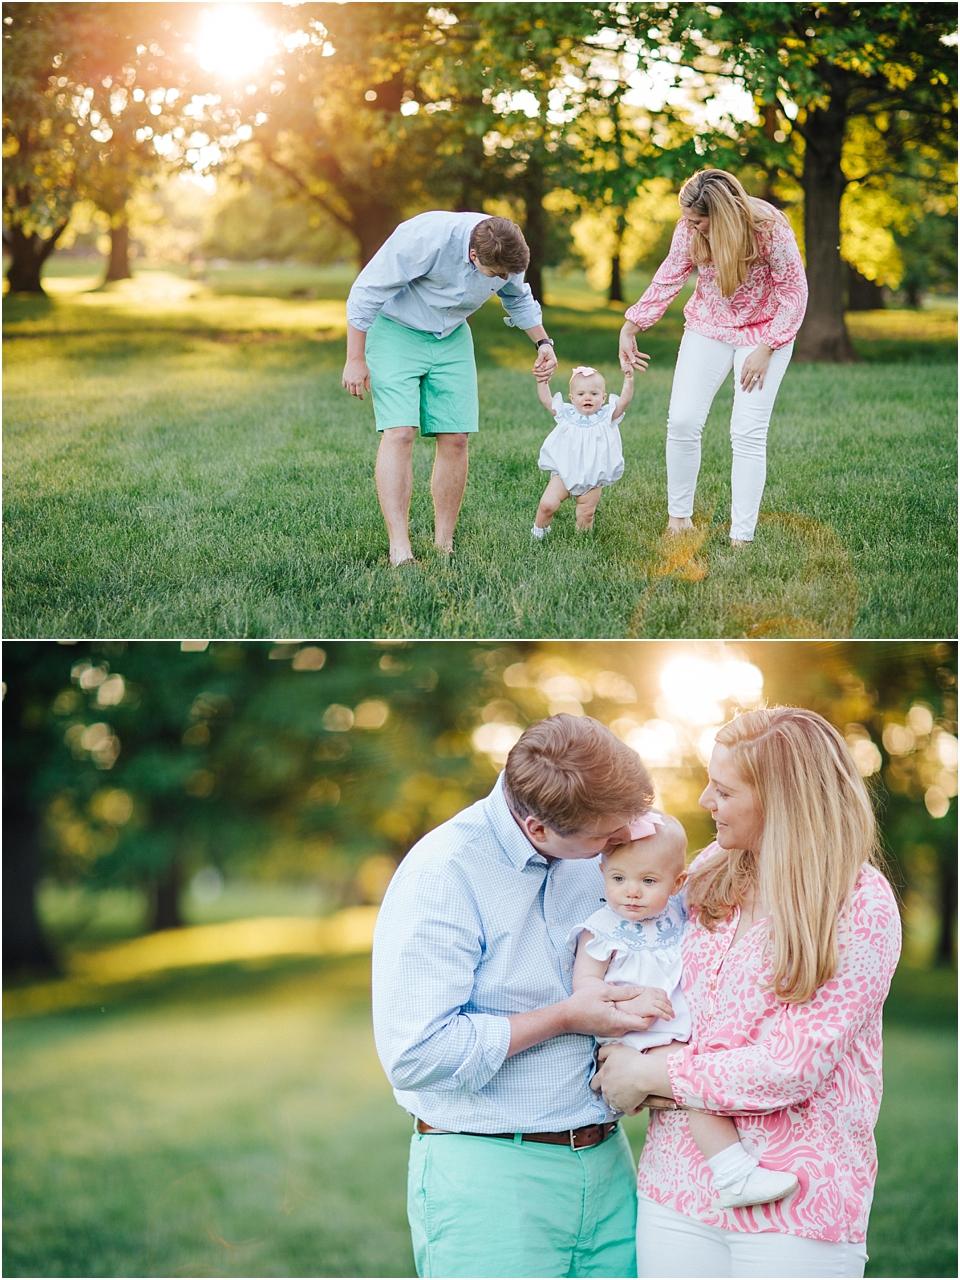 kansascityfamilyphotographer_0315